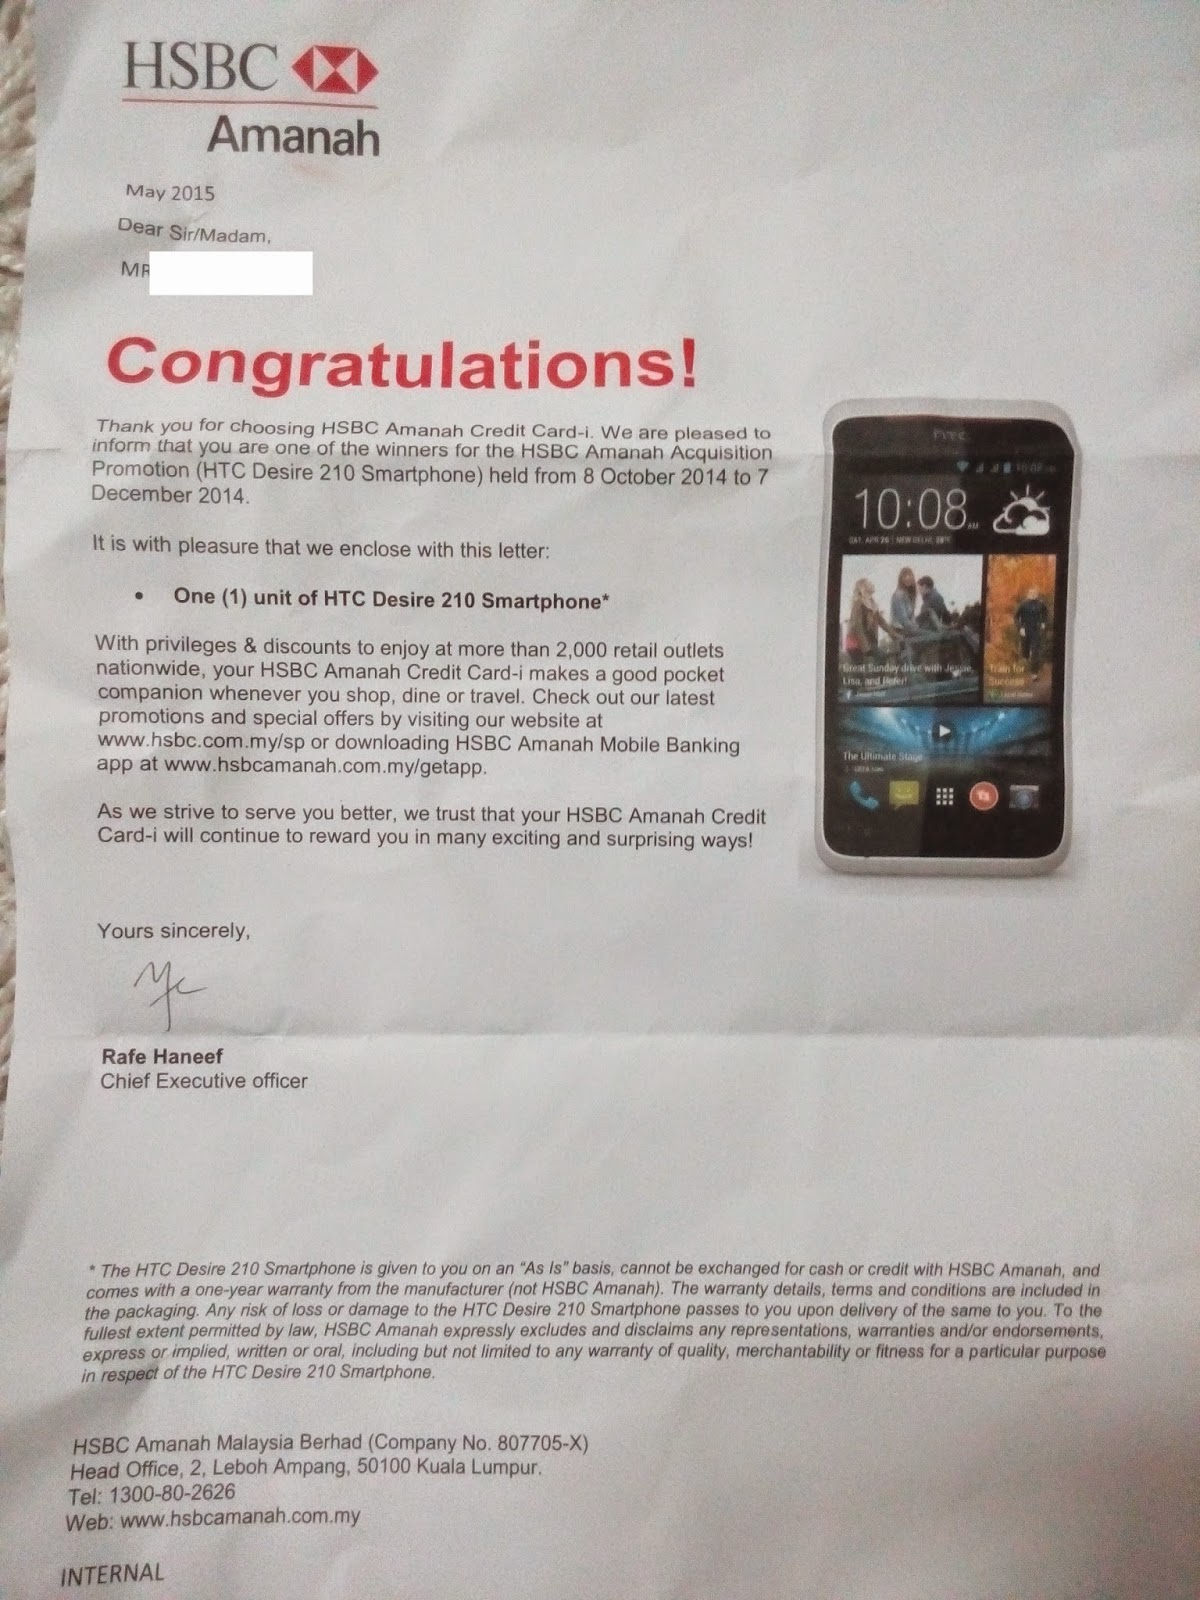 My Life: HSBC Gift: HTC Desire 210 Smartphone